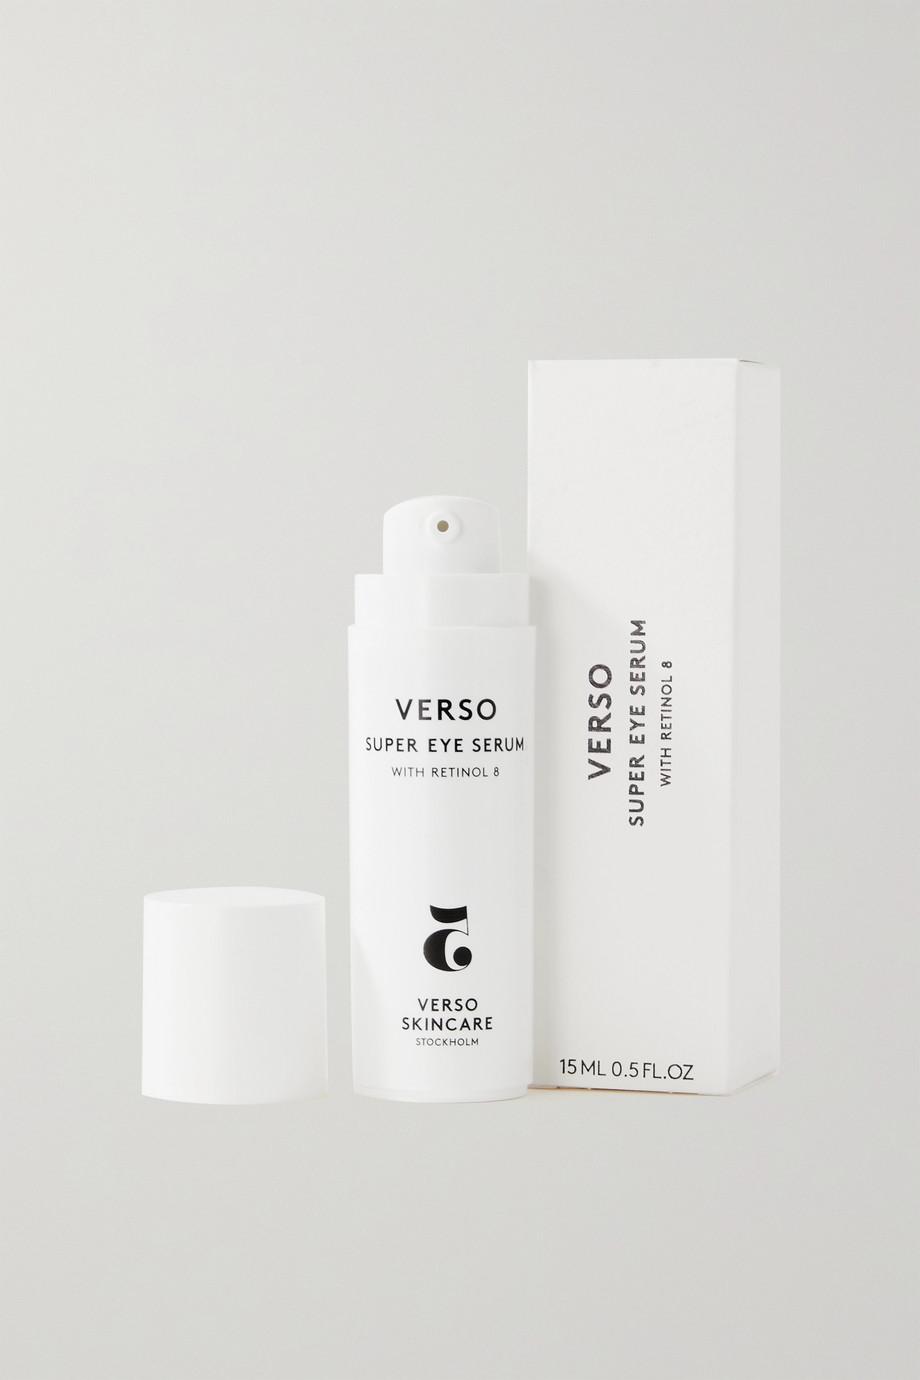 Verso Super Eye Serum, 15ml